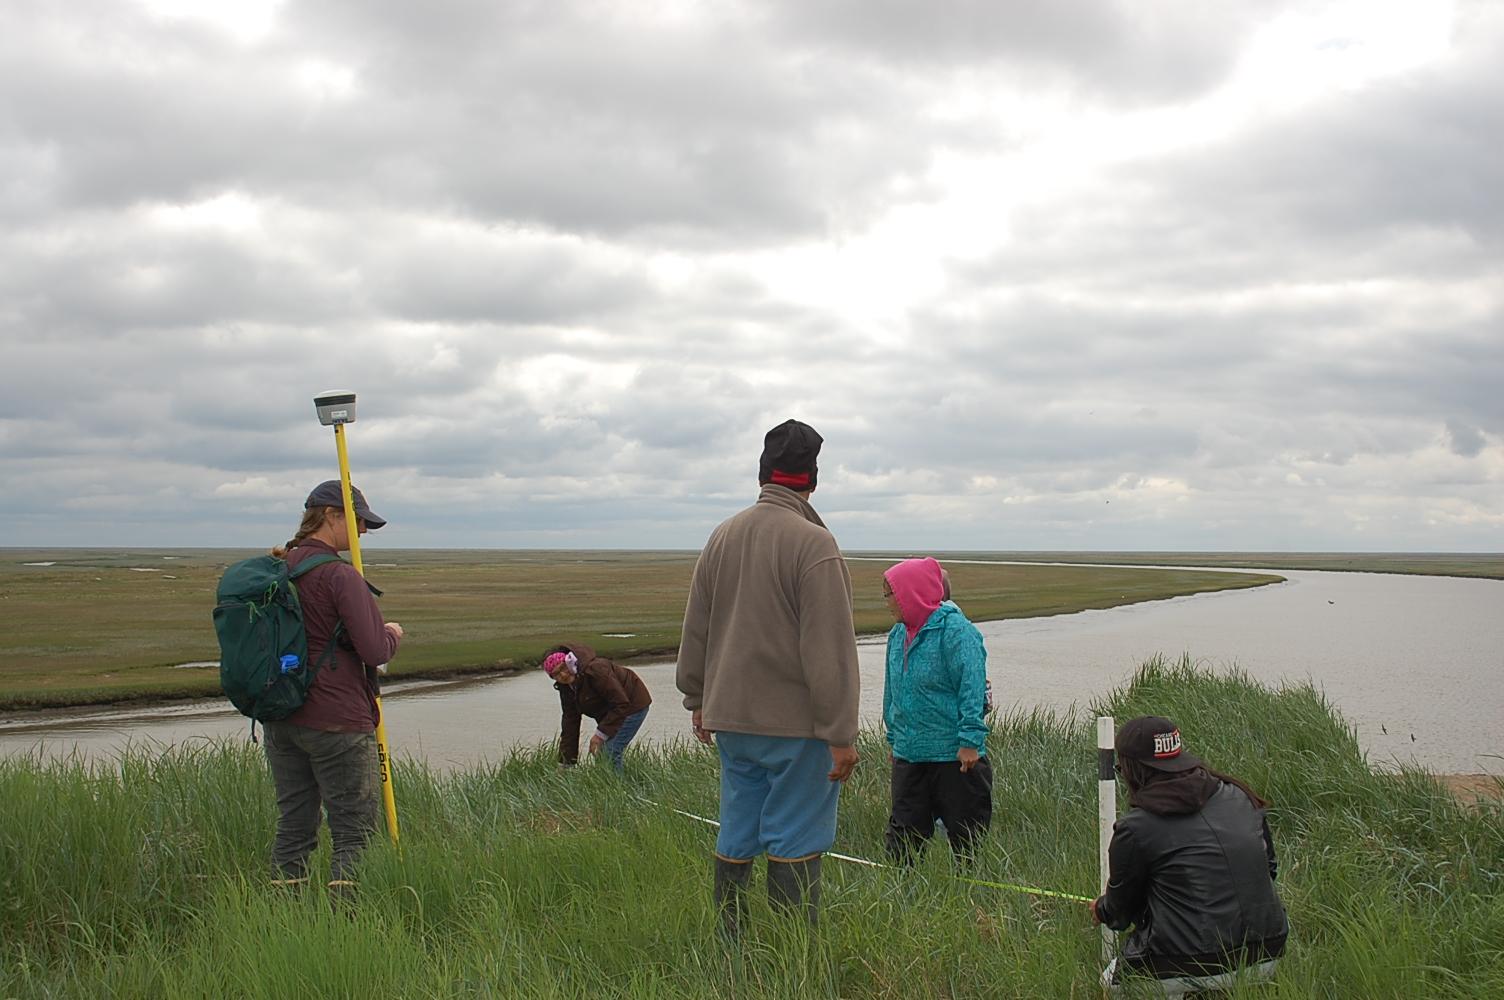 Figure 3. Installing erosion monitoring in Chevak, Alaska in June 2017. Photo courtesy of Denise Pollock.